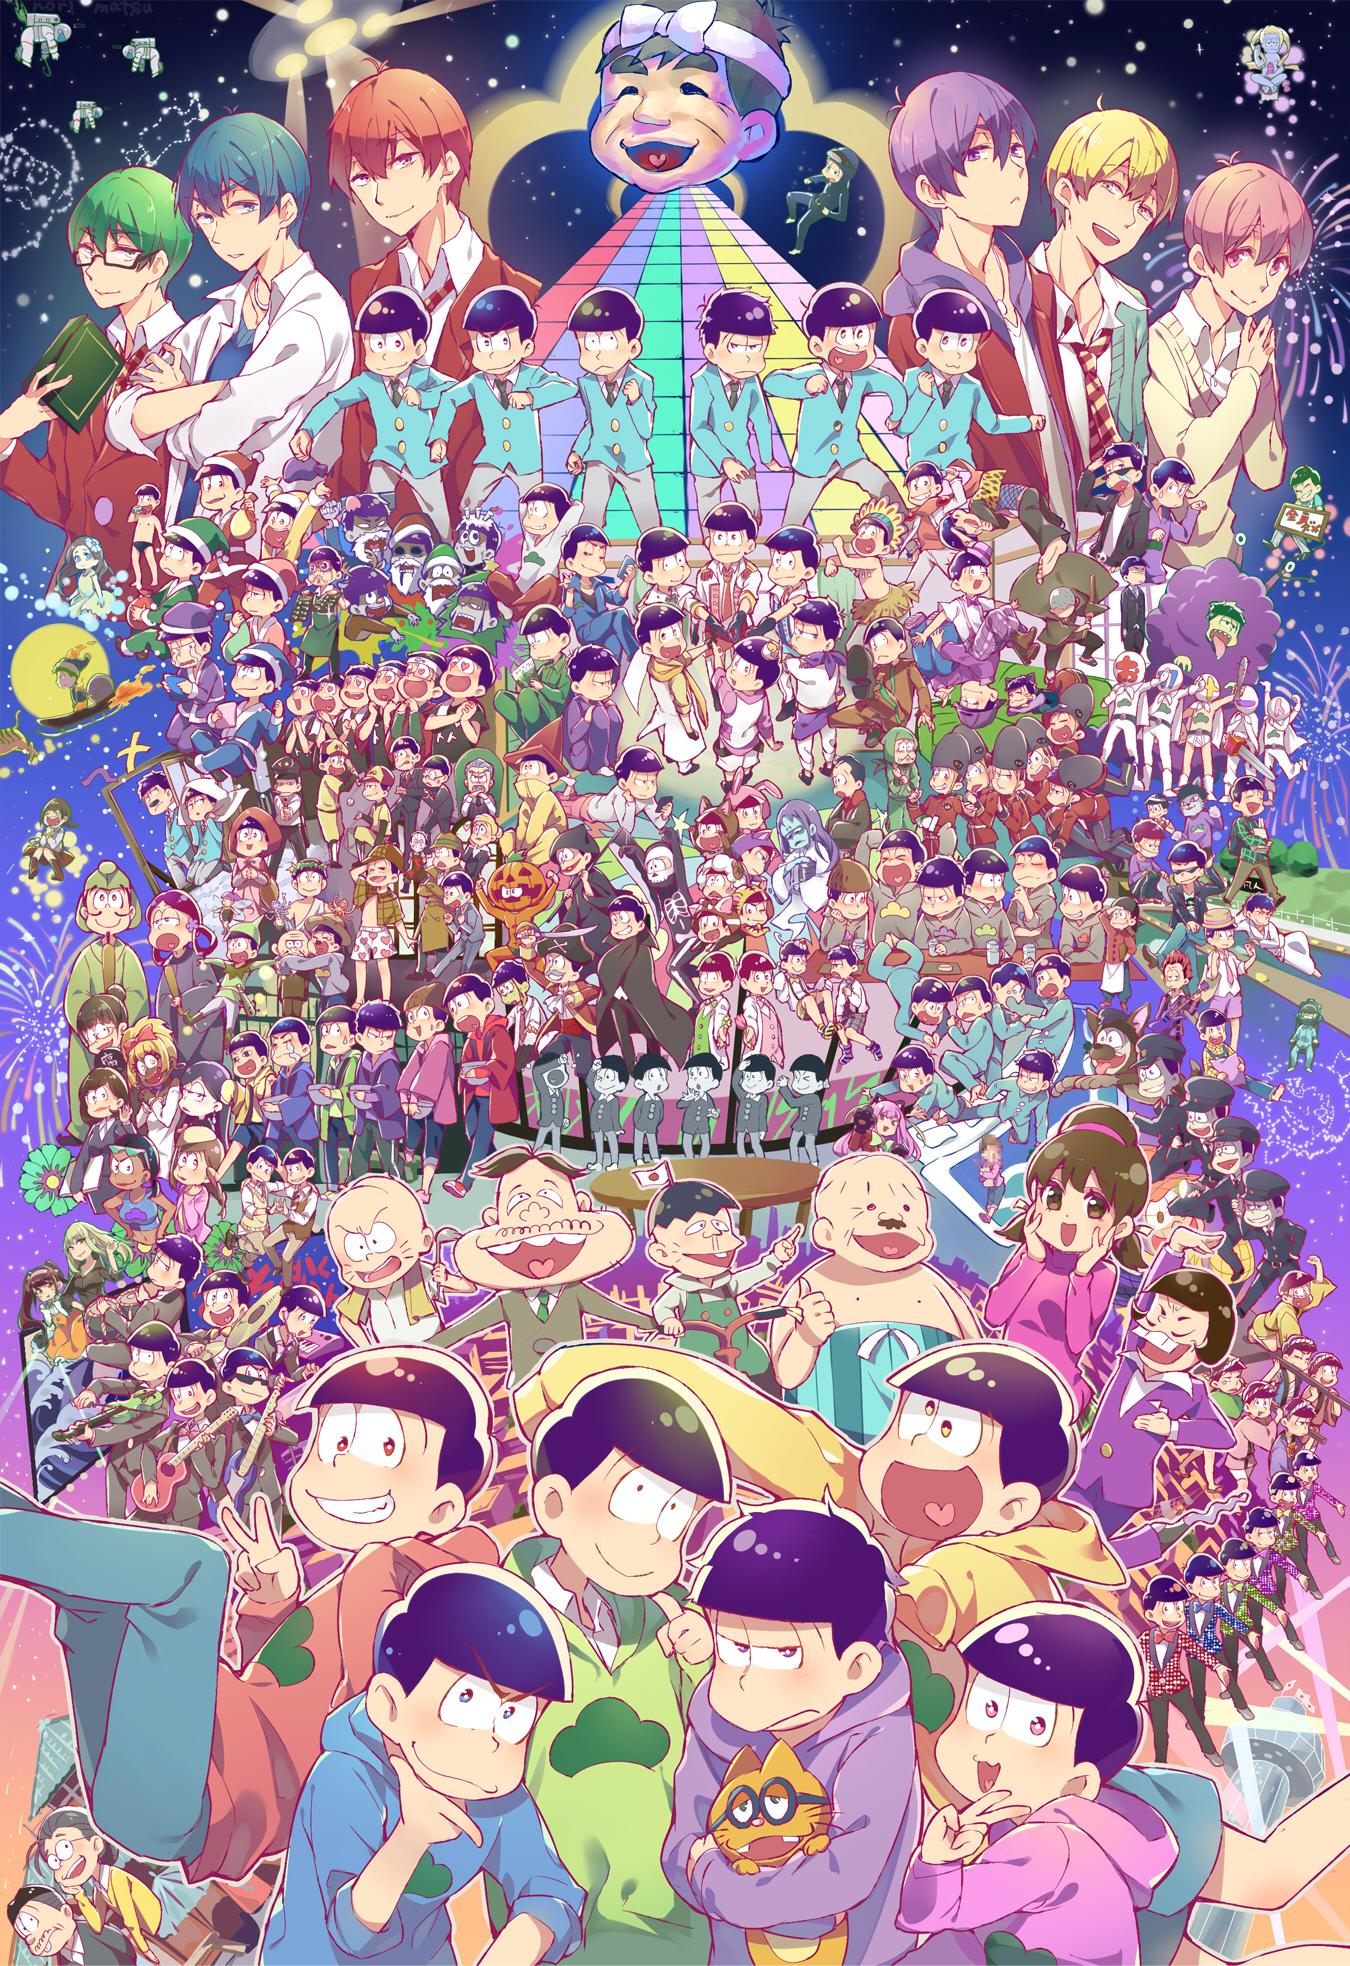 Iphone X Wallpaper Official Download Osomatsu Images Osomatsu San Fanart Hd Wallpaper And